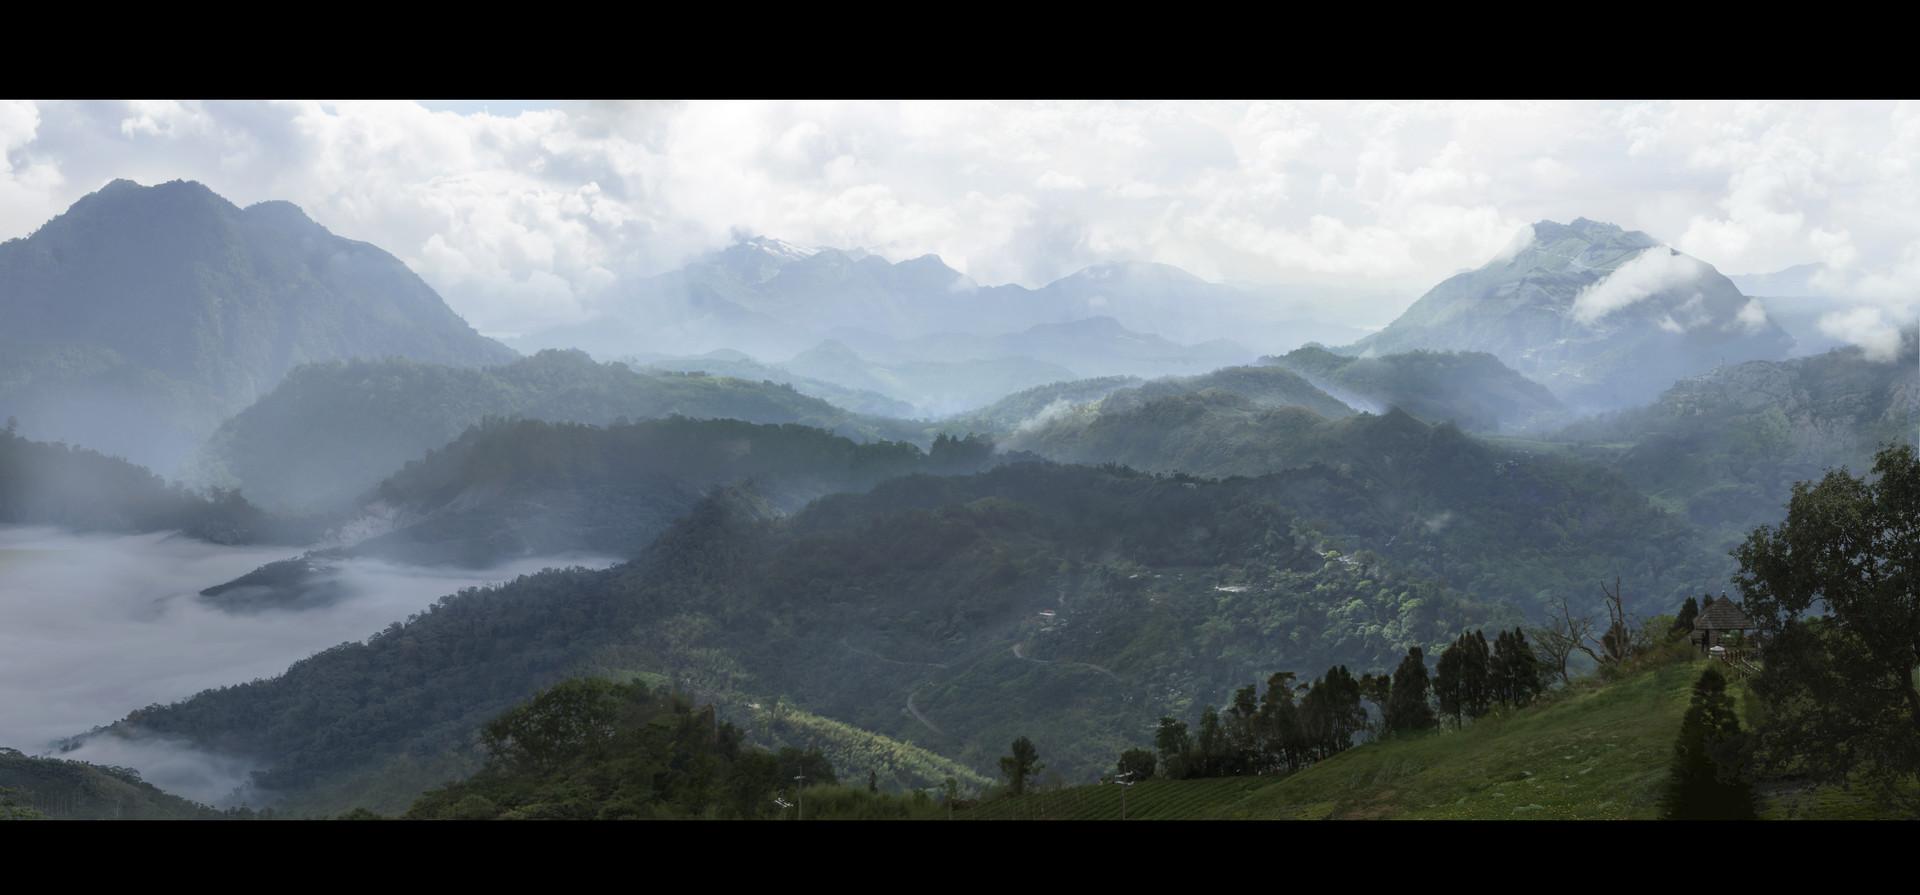 Michael morris valley 002